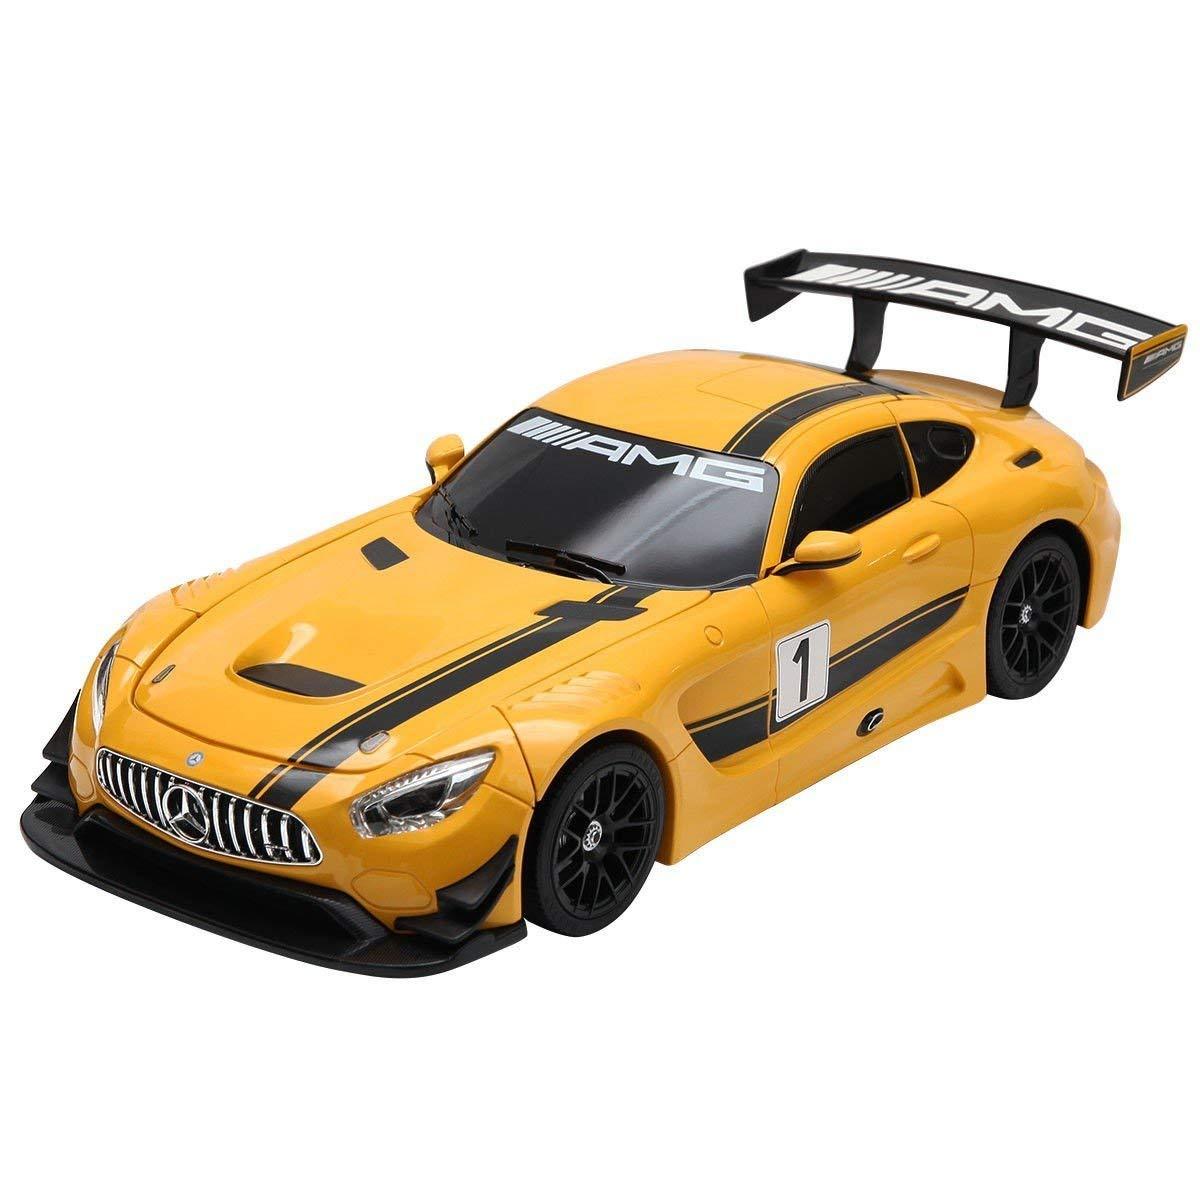 PowerTRC 1:14 Mercedes-Benz GT3 2.4ghz RC Transformer Dancing Robot Car Yellow by PowerTRC (Image #3)